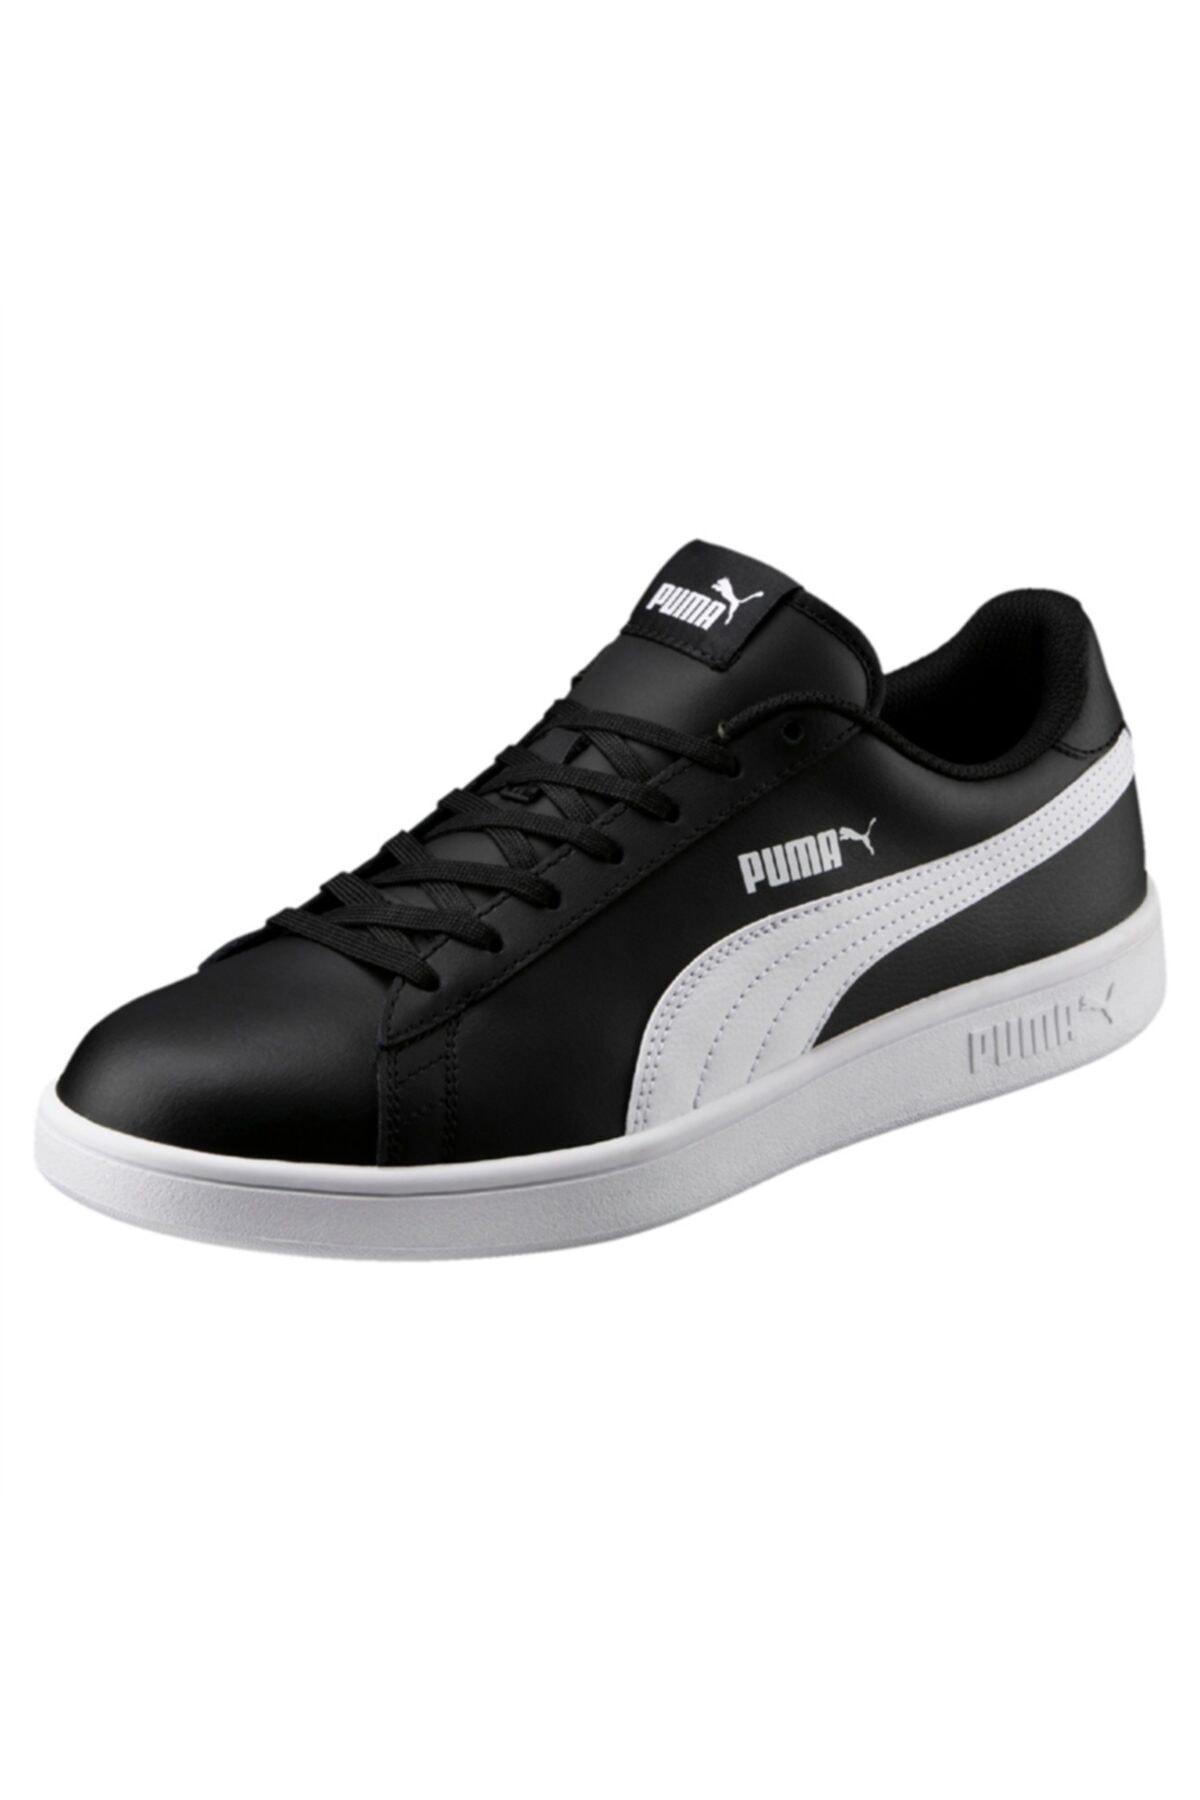 Puma SMASH V2 L Siyah BEYAZ Unisex Deri Sneaker 100323982 2